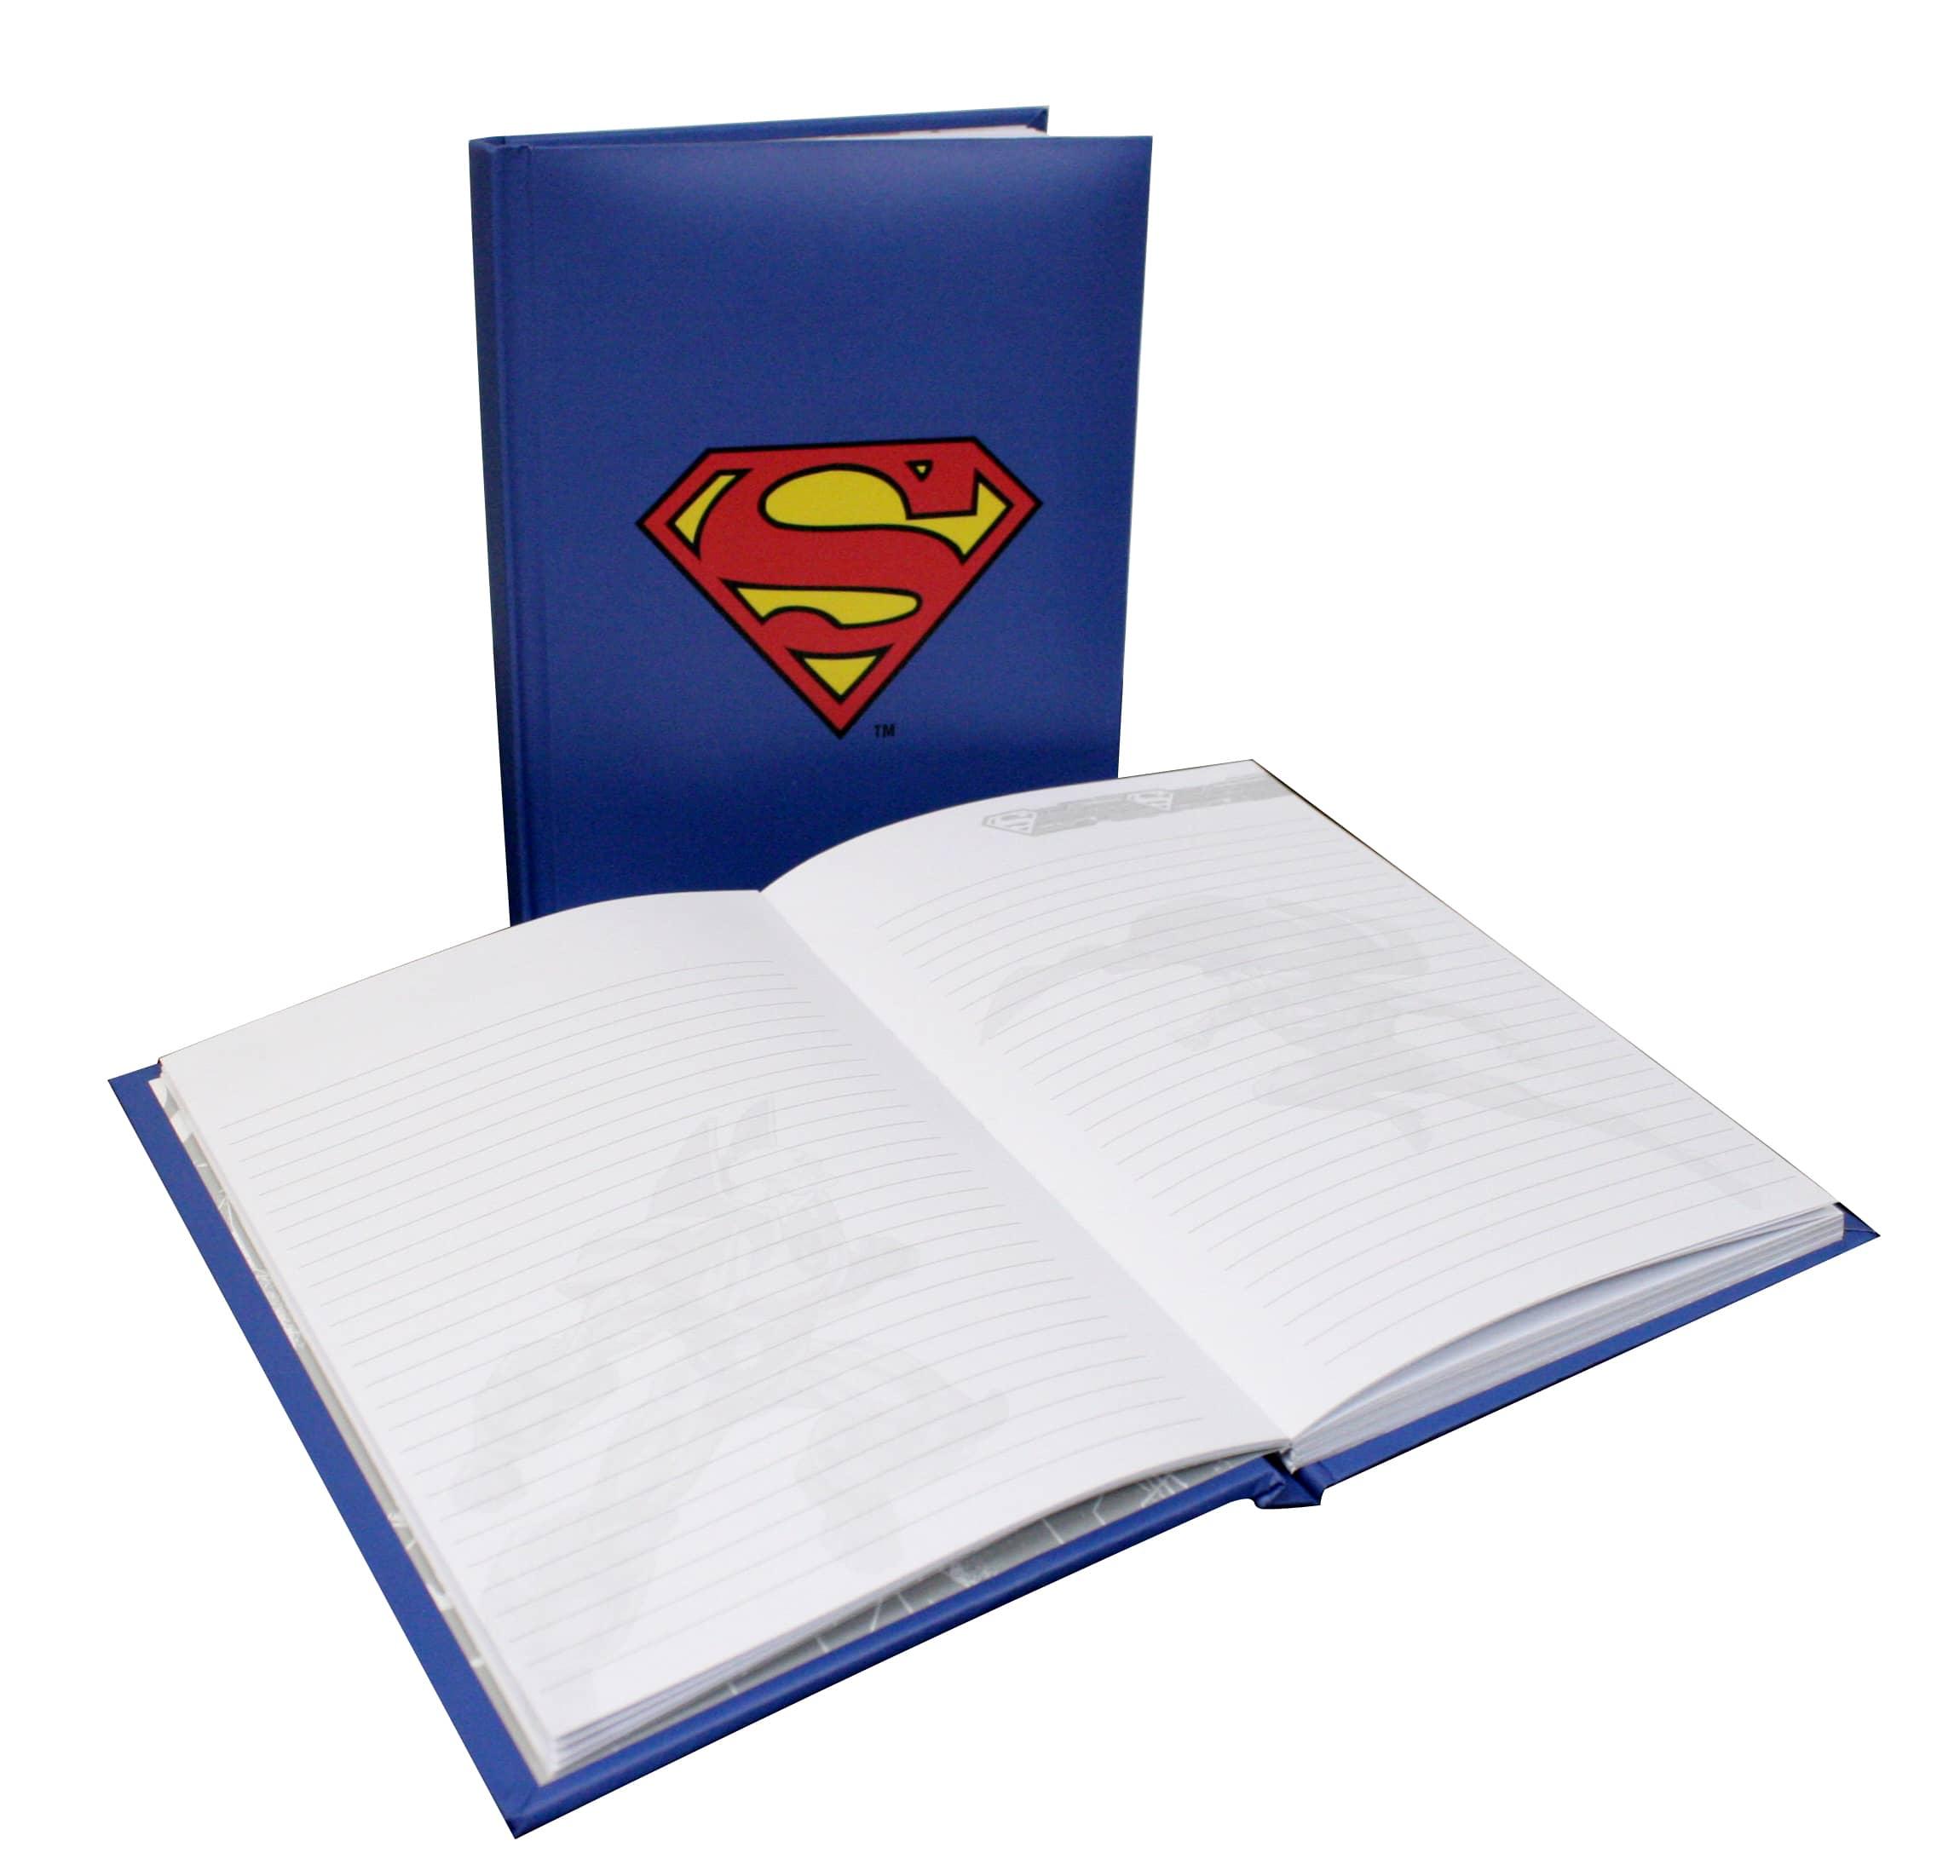 SUPERMAN LIBRETA CON LUZ DC